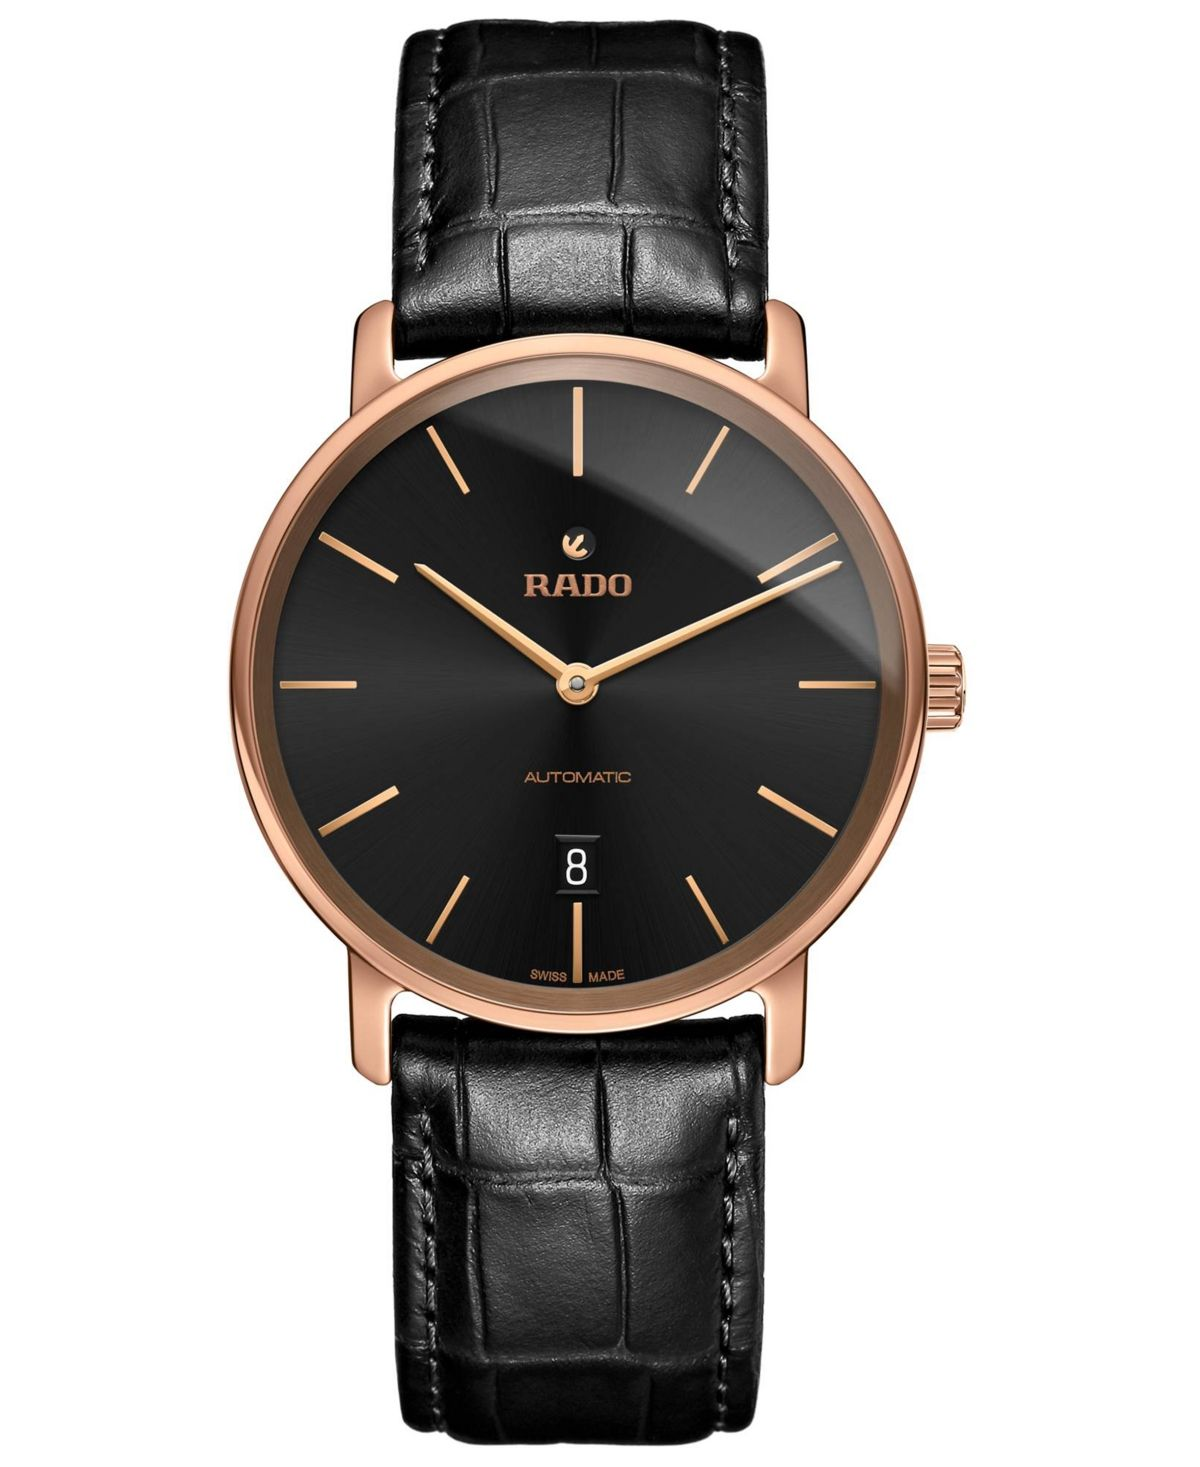 Rado Watch Leather Strap